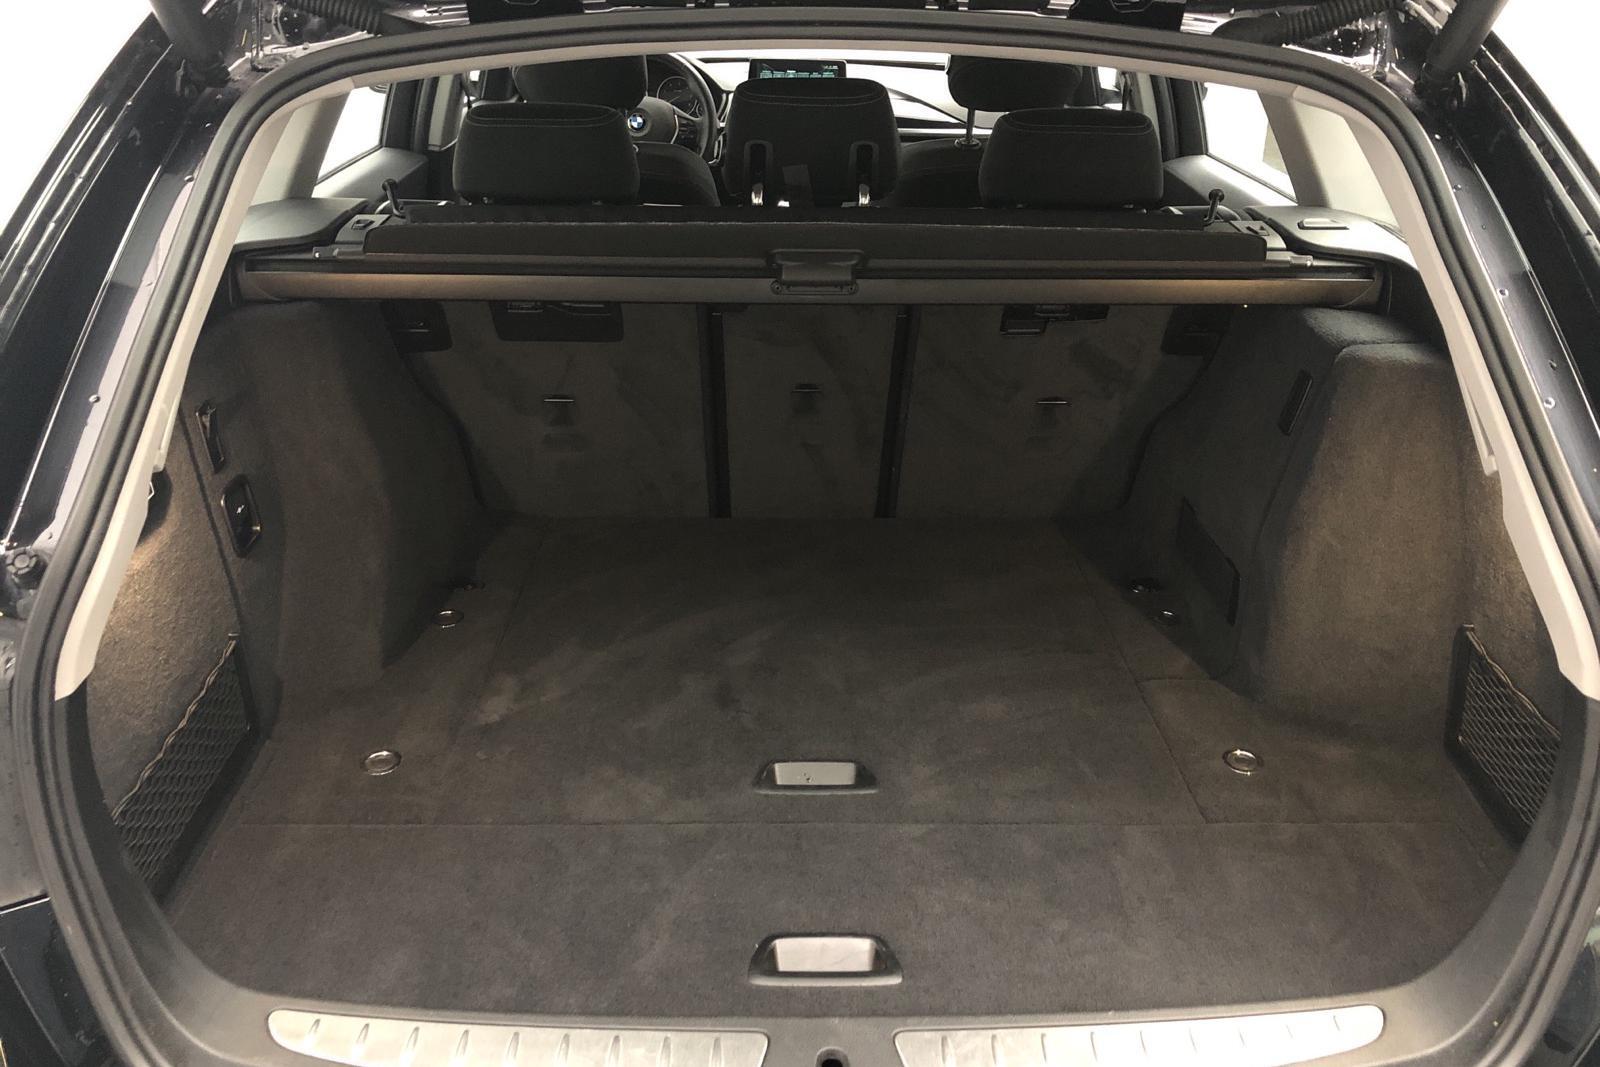 BMW 318d Touring, F31 (150hk) - 67 736 km - Automatic - black - 2017